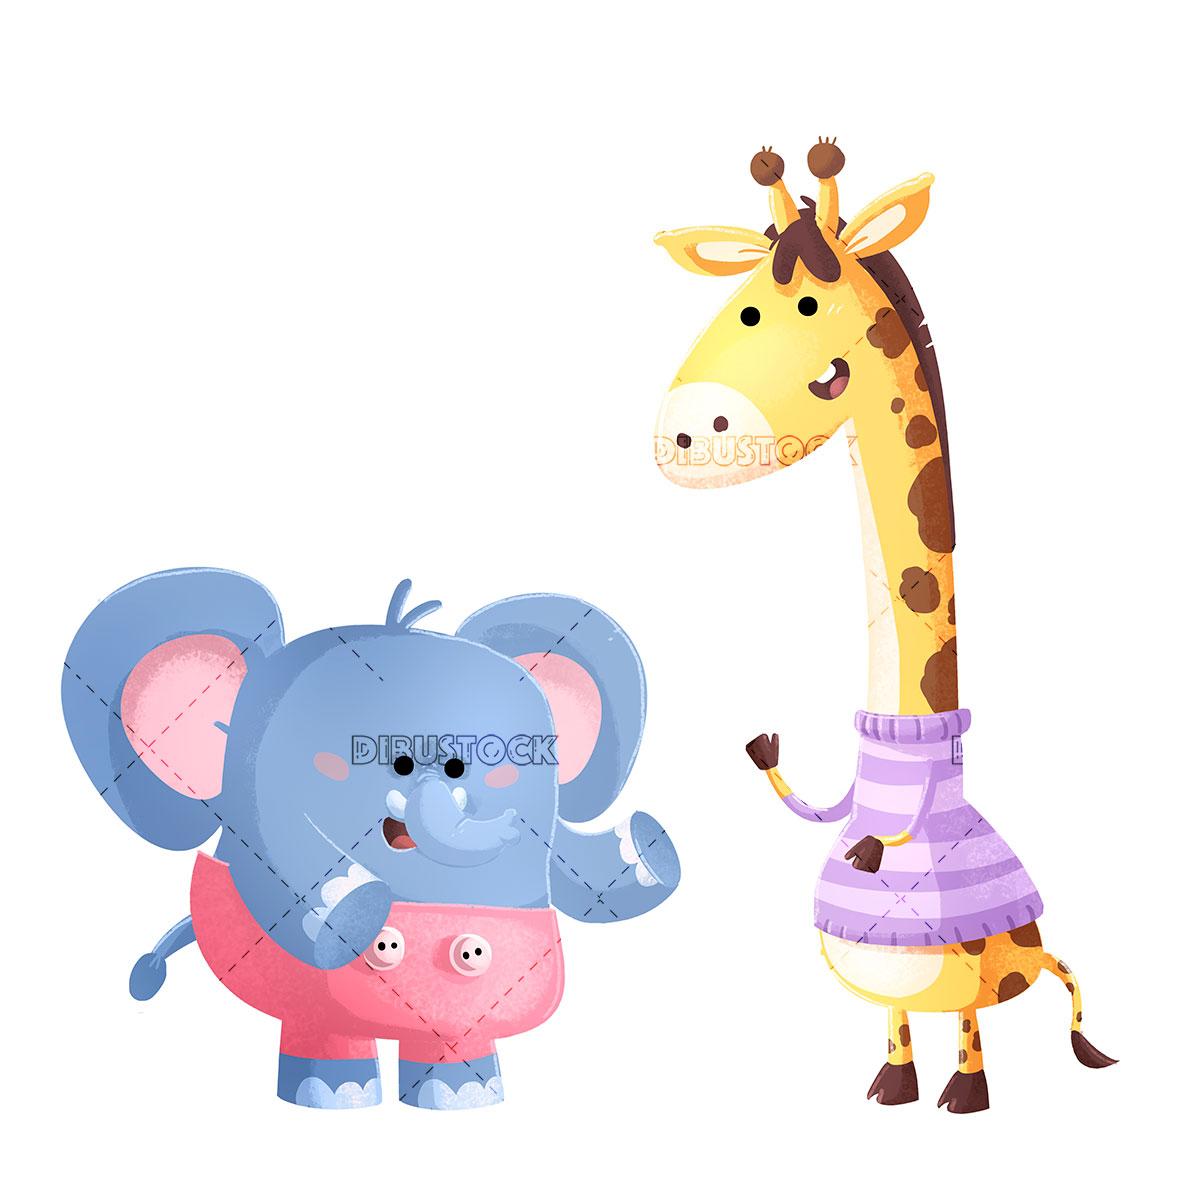 Elephant and giraffe on isolated background